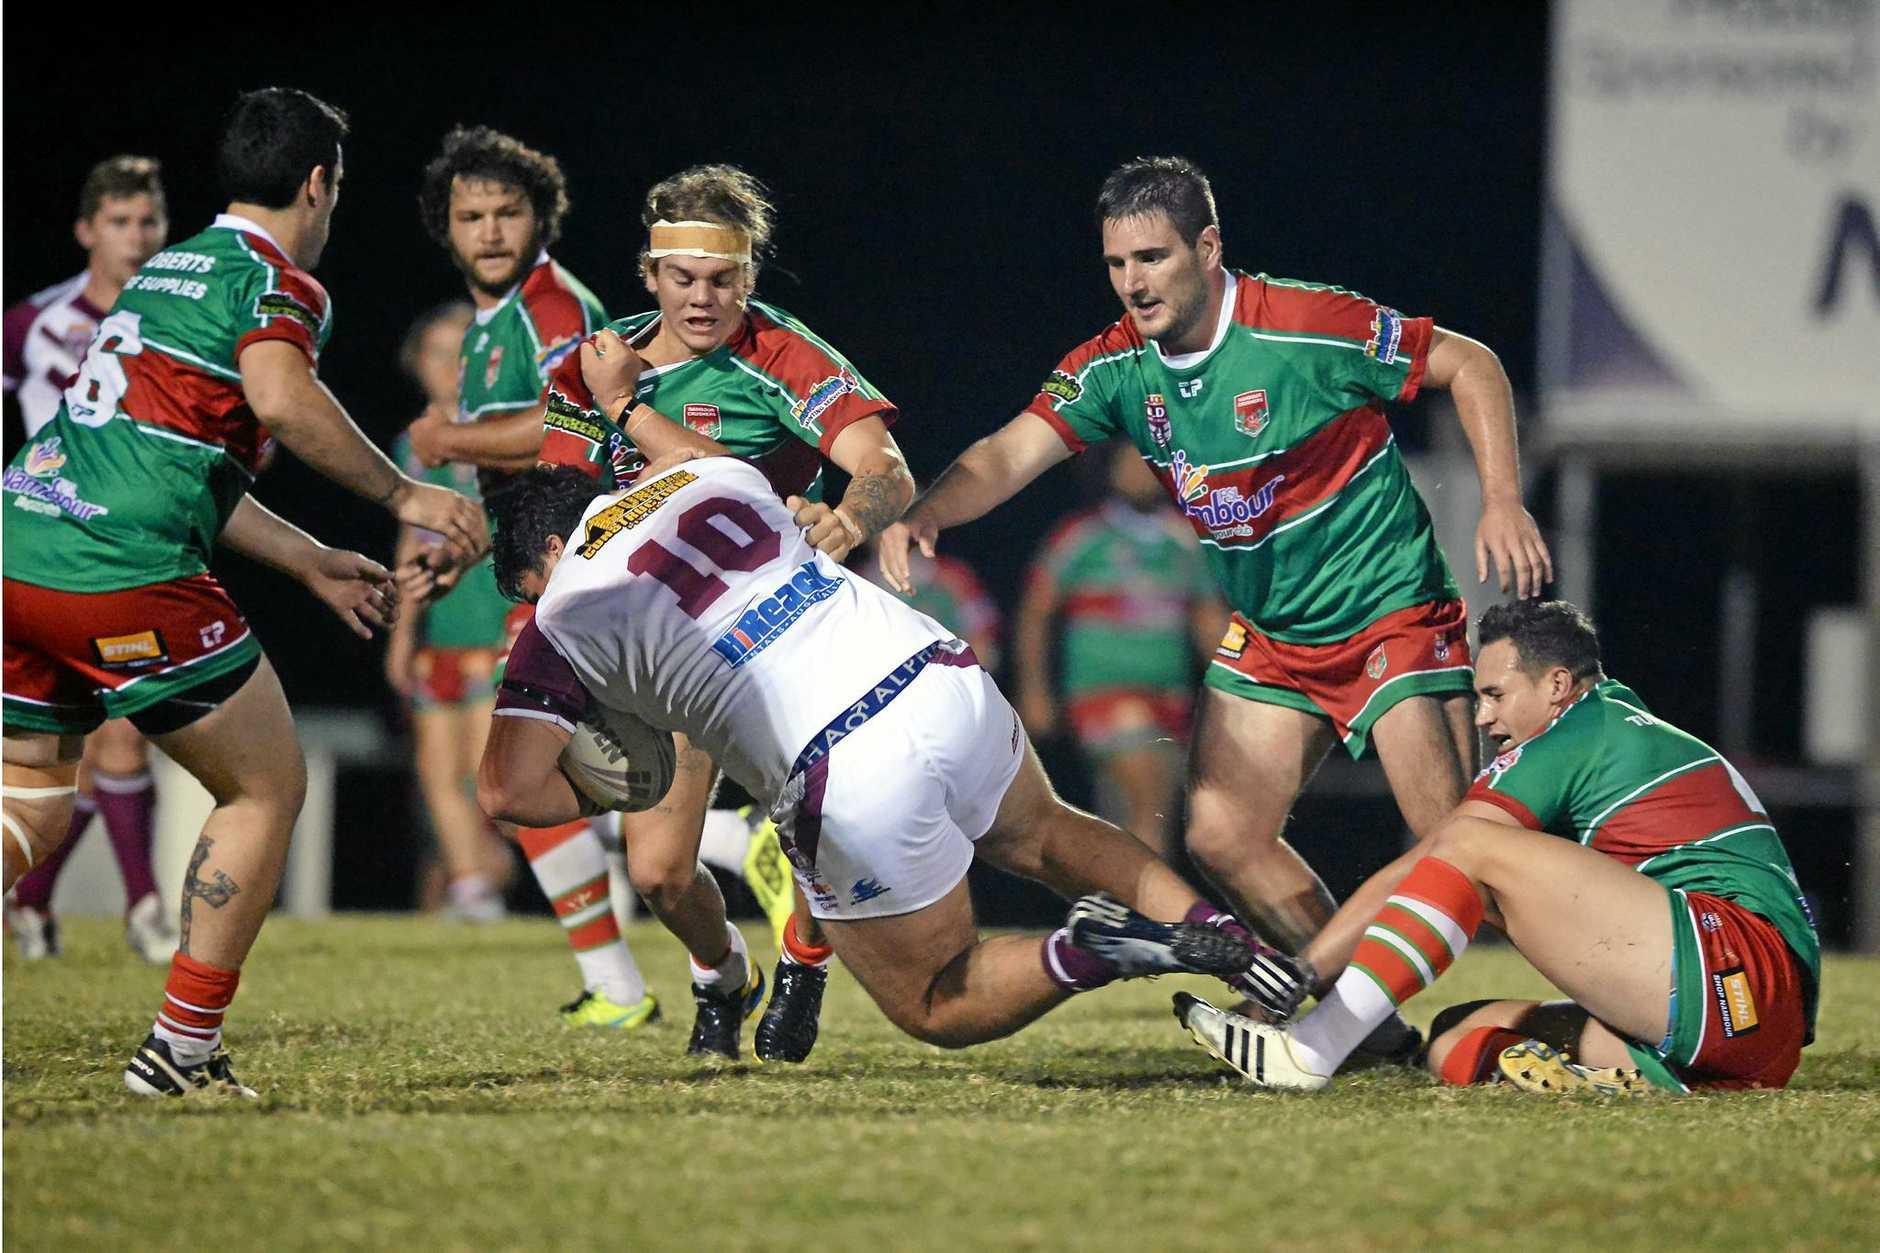 Rugby league. Nambour v Kawana at Crusher Park, Nambour. Kawana player Price Imlach takes the ball up.